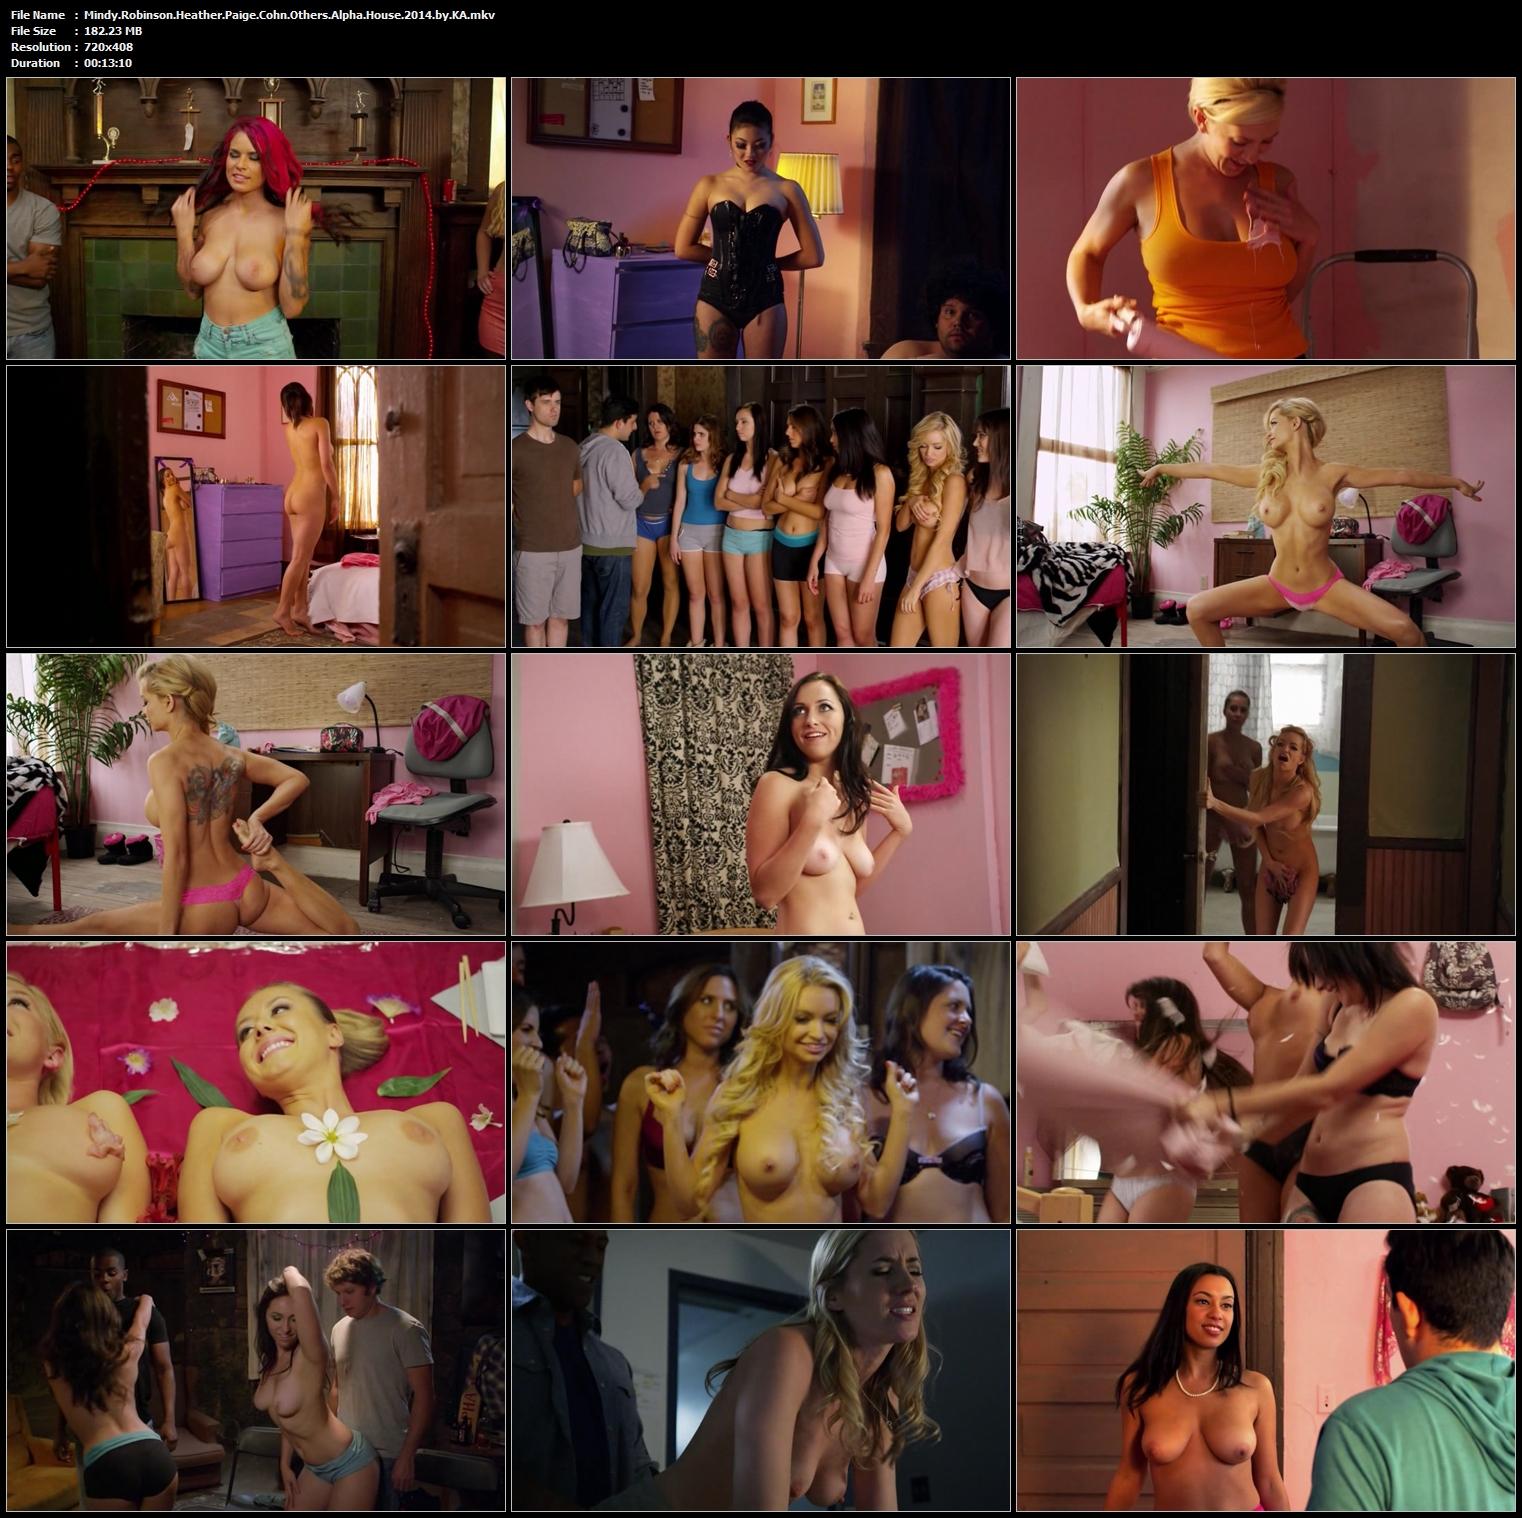 Mindy.Robinson.Heather.Paige.Cohn.Others.Alpha.House.2014.by.KA.mkv